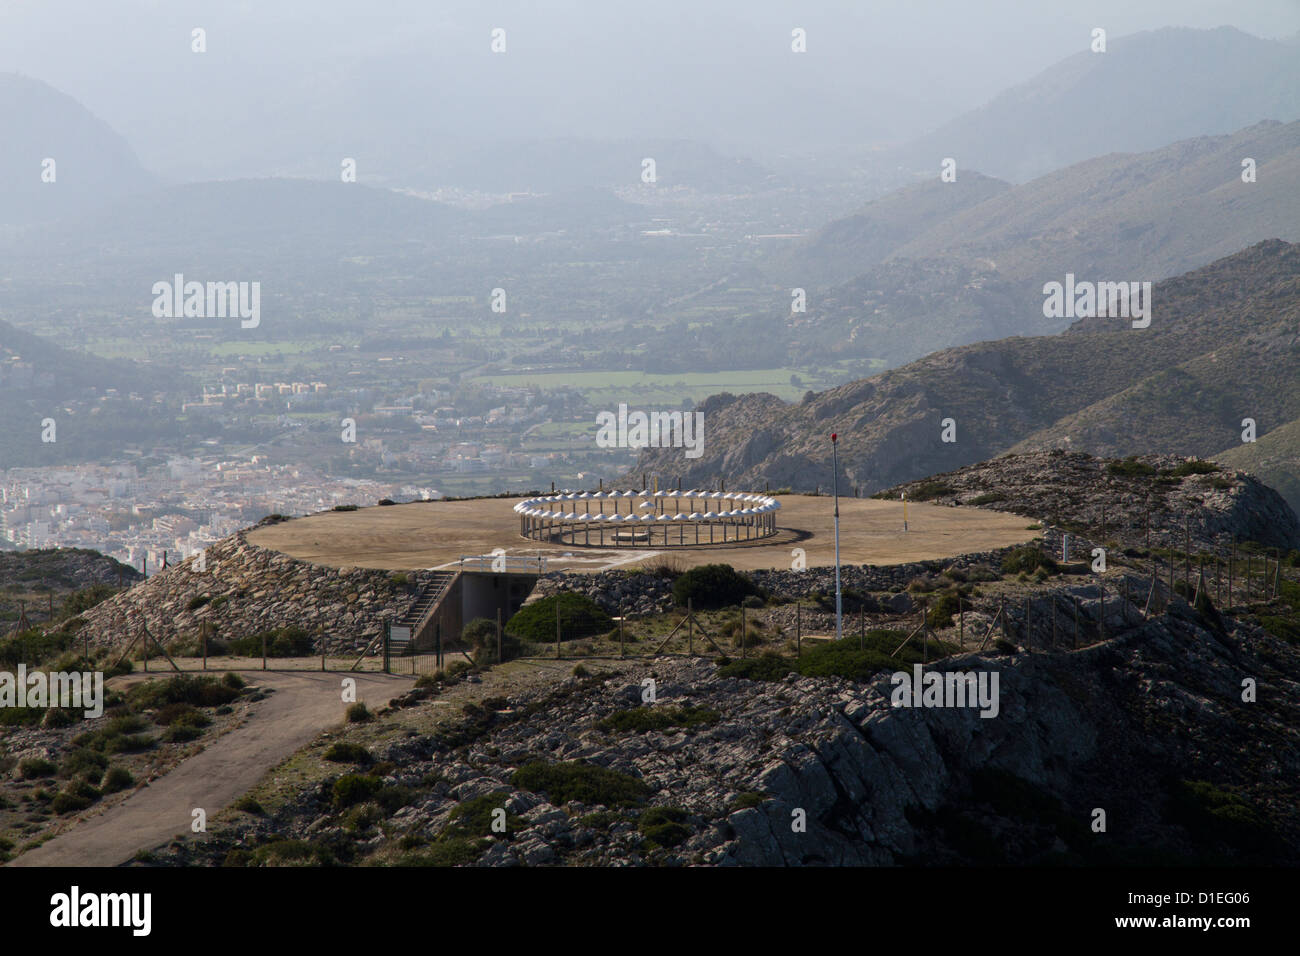 aeronautical control communication platform Formentor Mallorca Majorca Balearic islands Spain Mediterranean - Stock Image